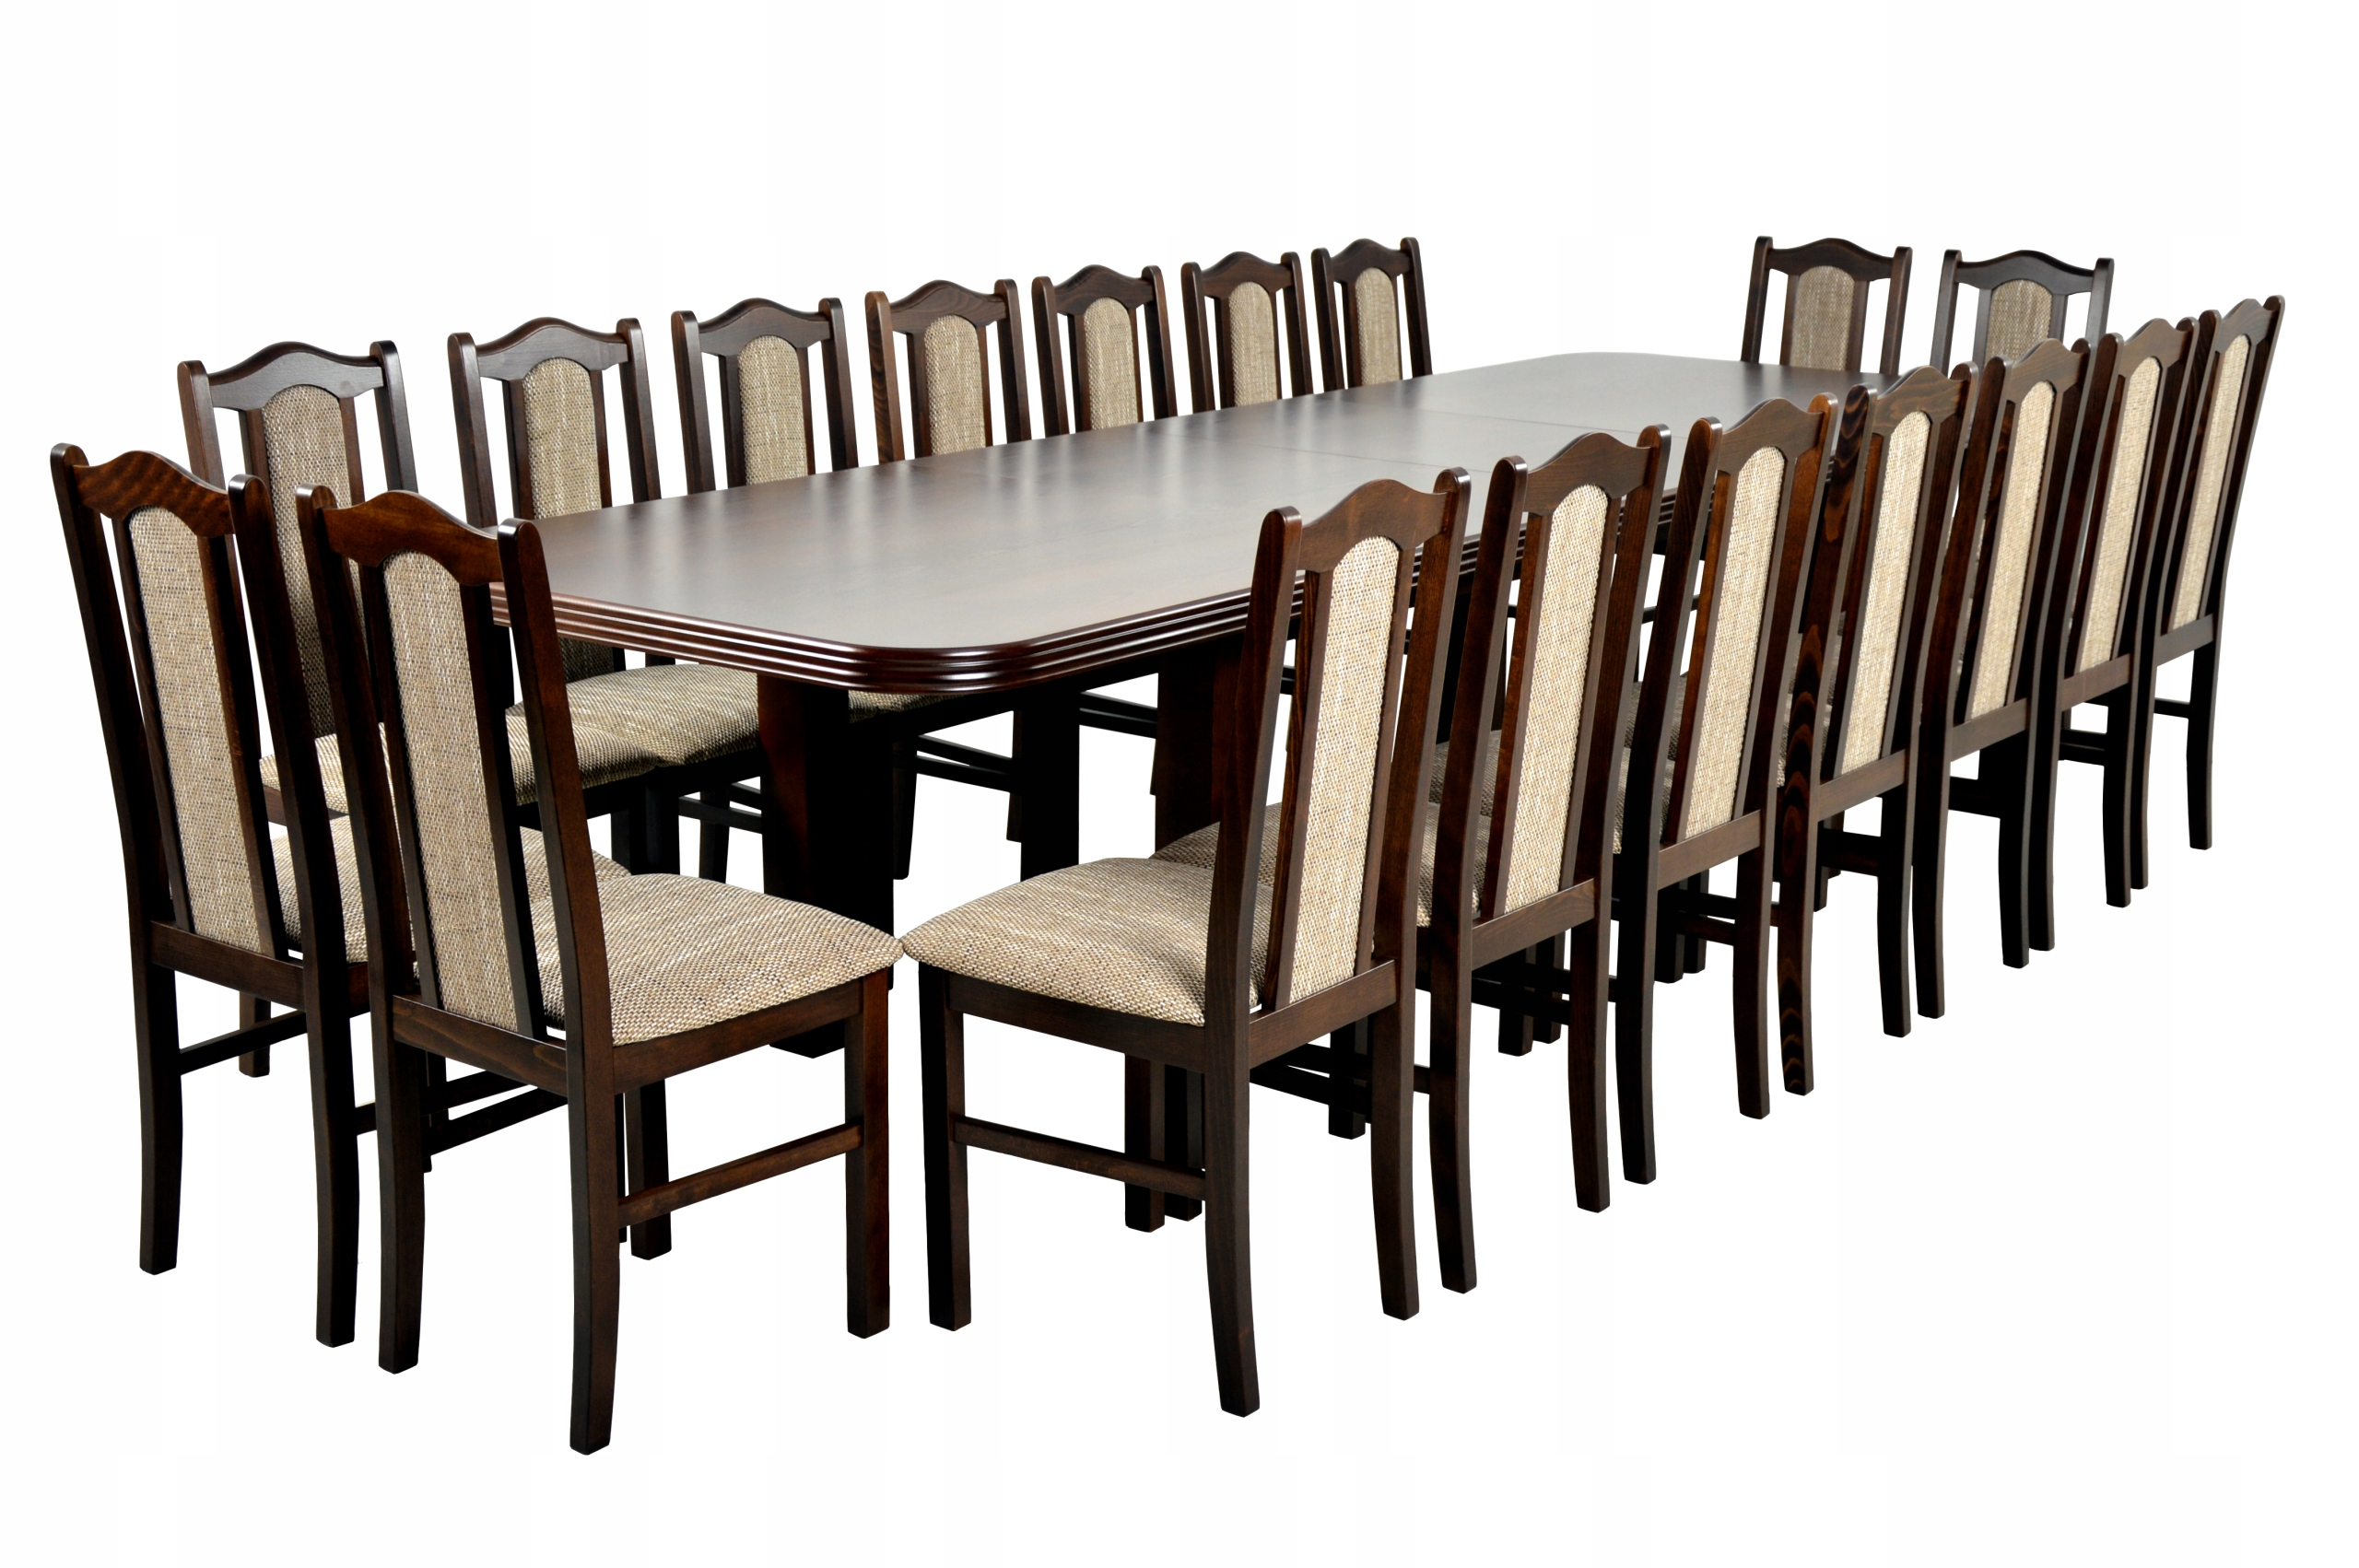 18 stoličky a stôl 100x200/300 cm DOPRAVA zdarma